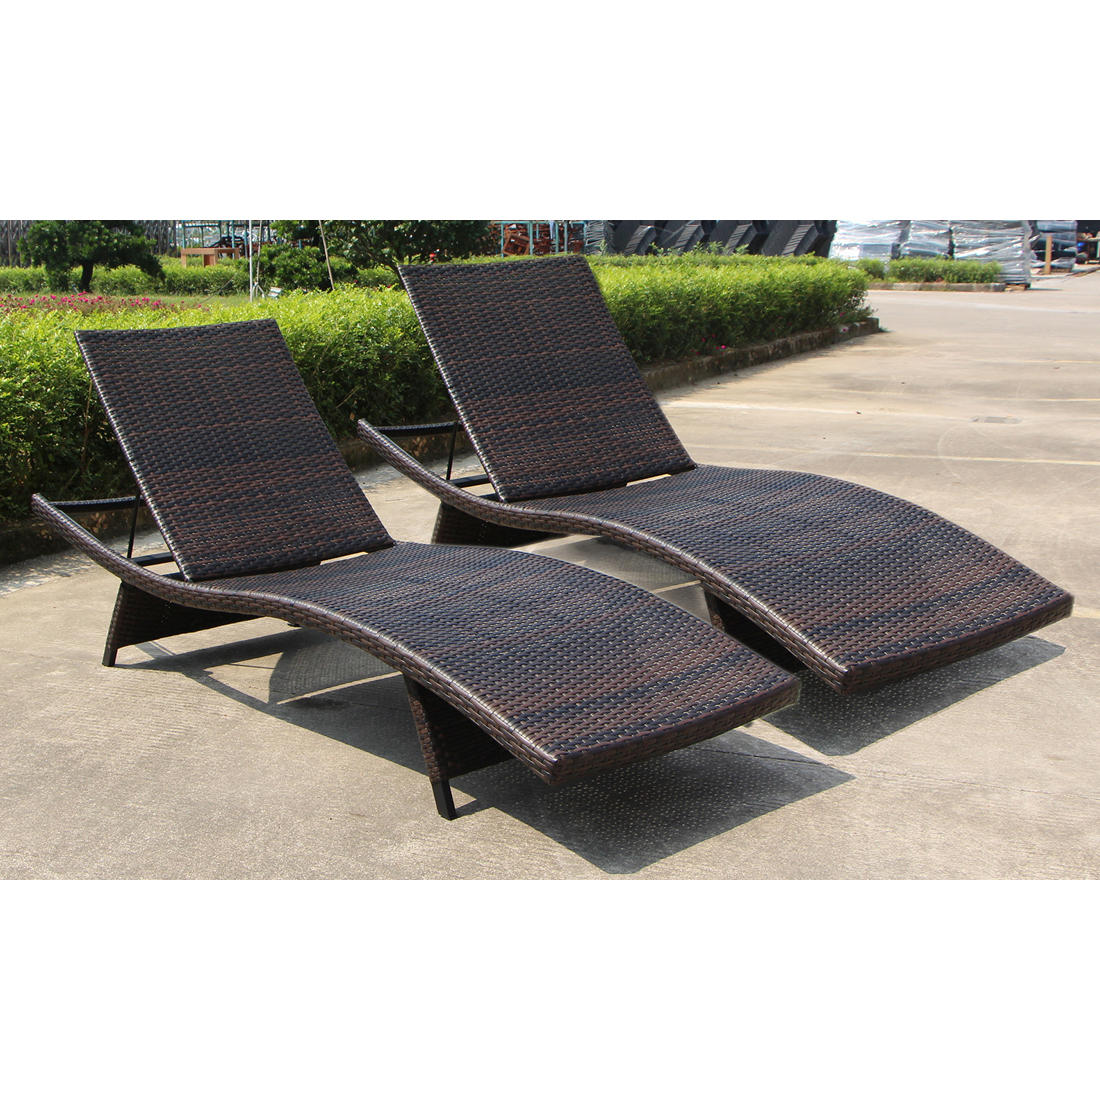 Admirable Berkley Jensen Wicker Chaise 2 Pk Brown Ibusinesslaw Wood Chair Design Ideas Ibusinesslaworg